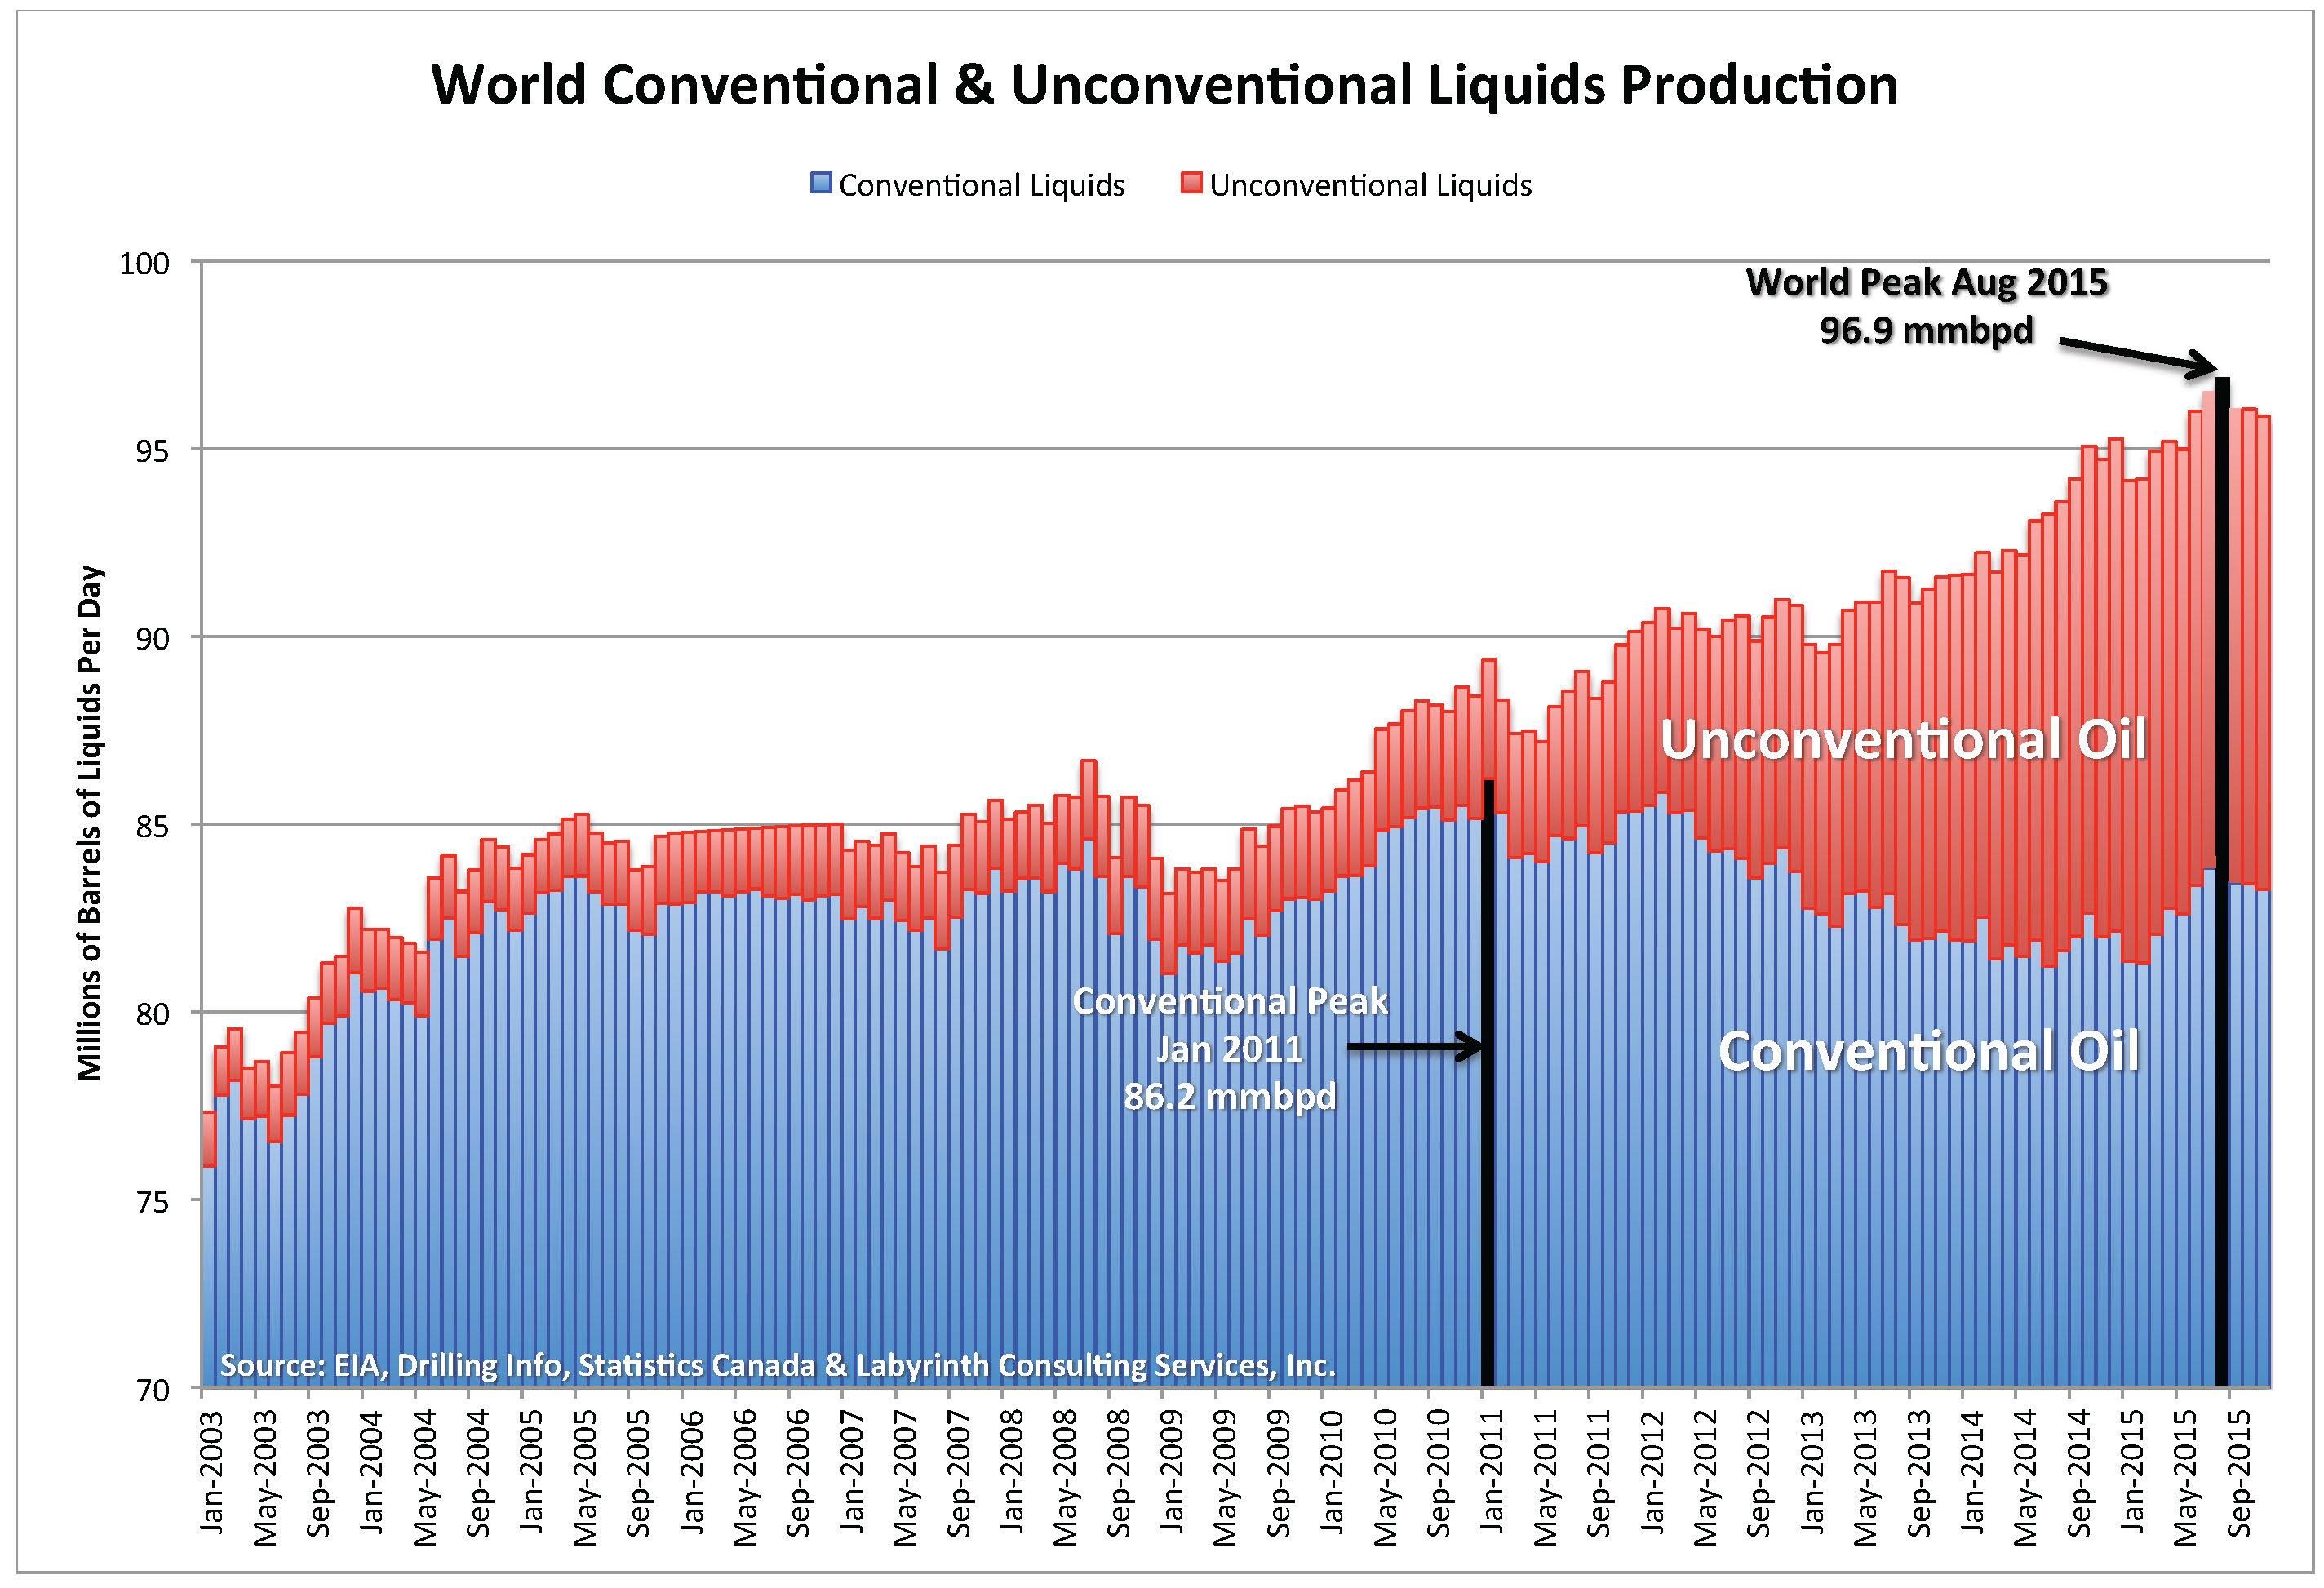 https://i0.wp.com/www.artberman.com/wp-content/uploads/Chart_World-Con-Uncon-1.jpg